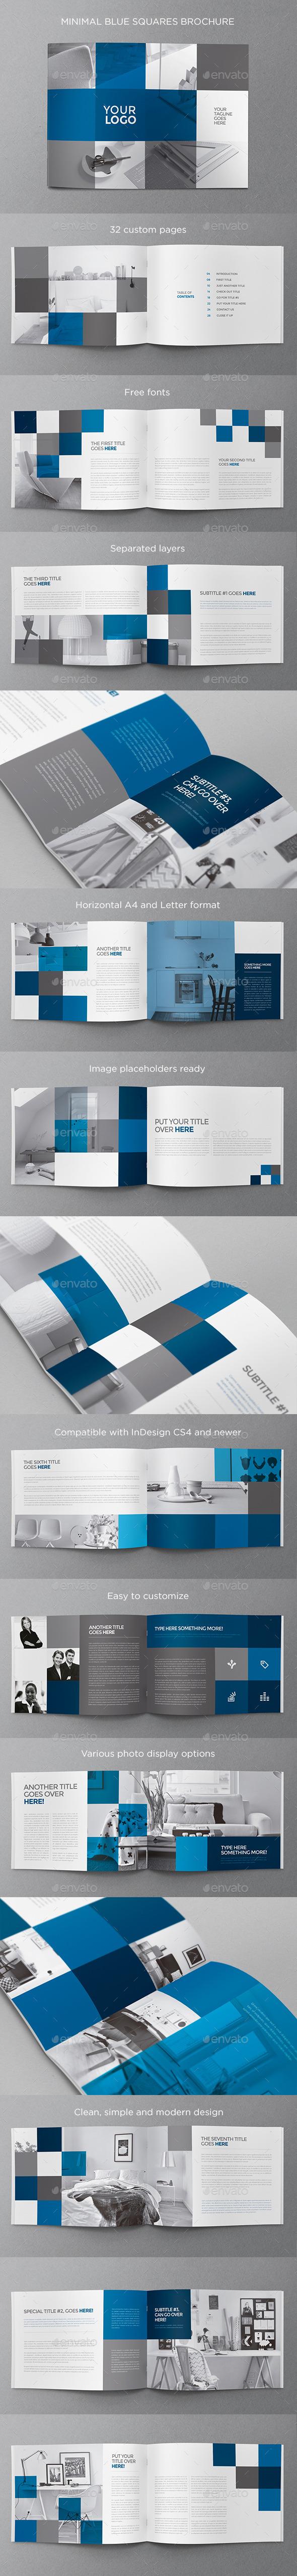 Minimal Blue Squares Brochure - Brochures Print Templates